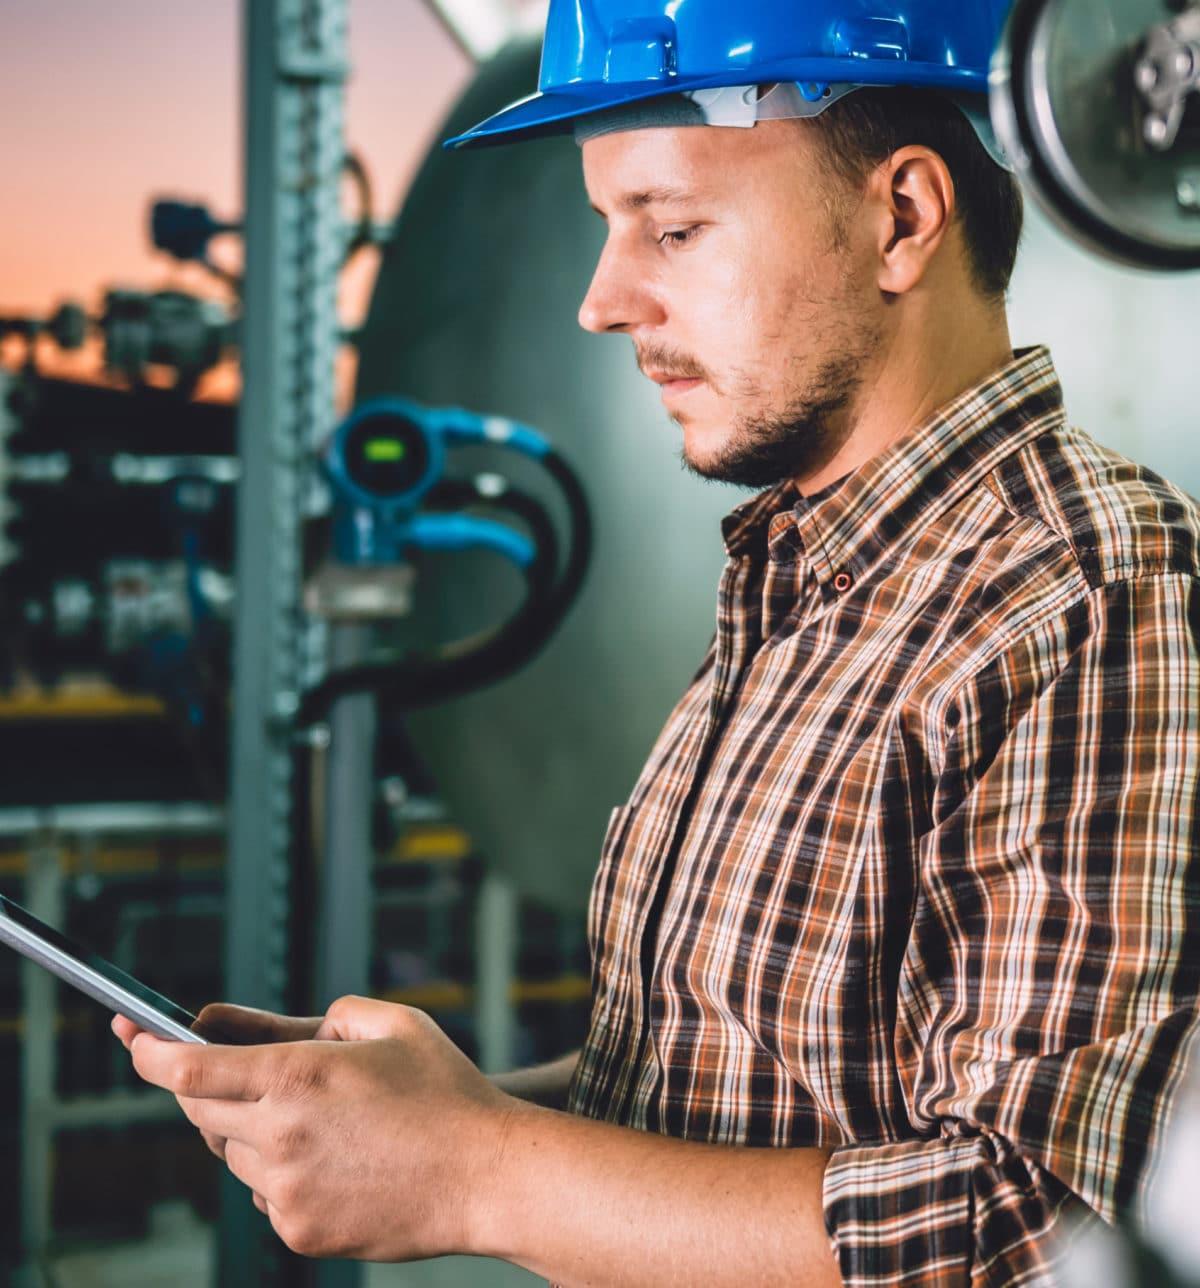 Man wearing blue hardhat using tablet at Natural gas processing facility